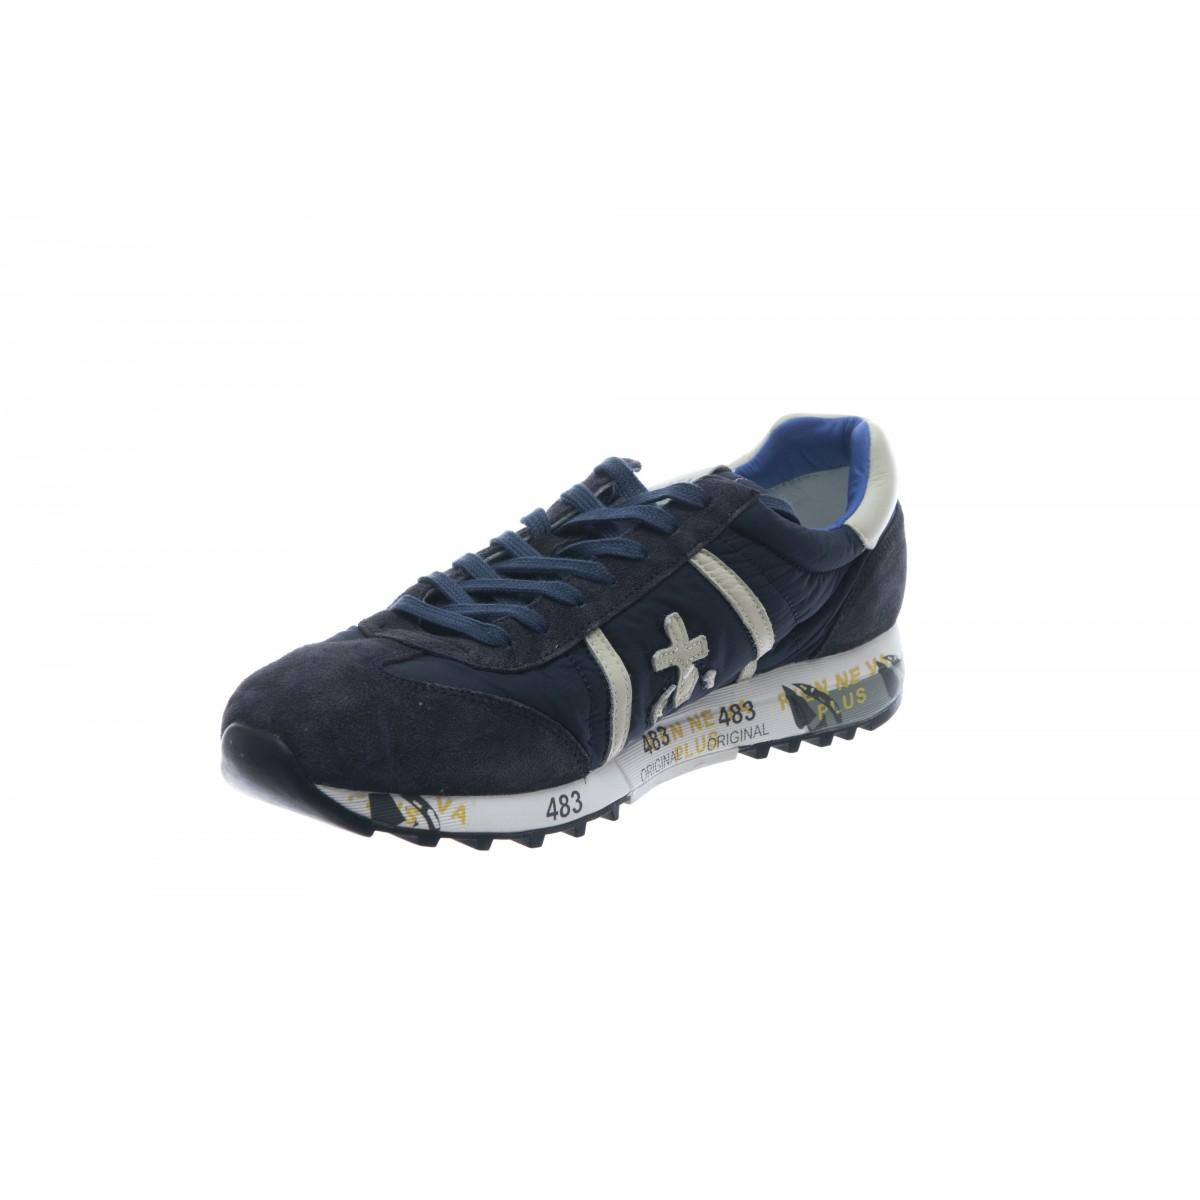 Scarpe - Lucy 2808 sneakers uomo